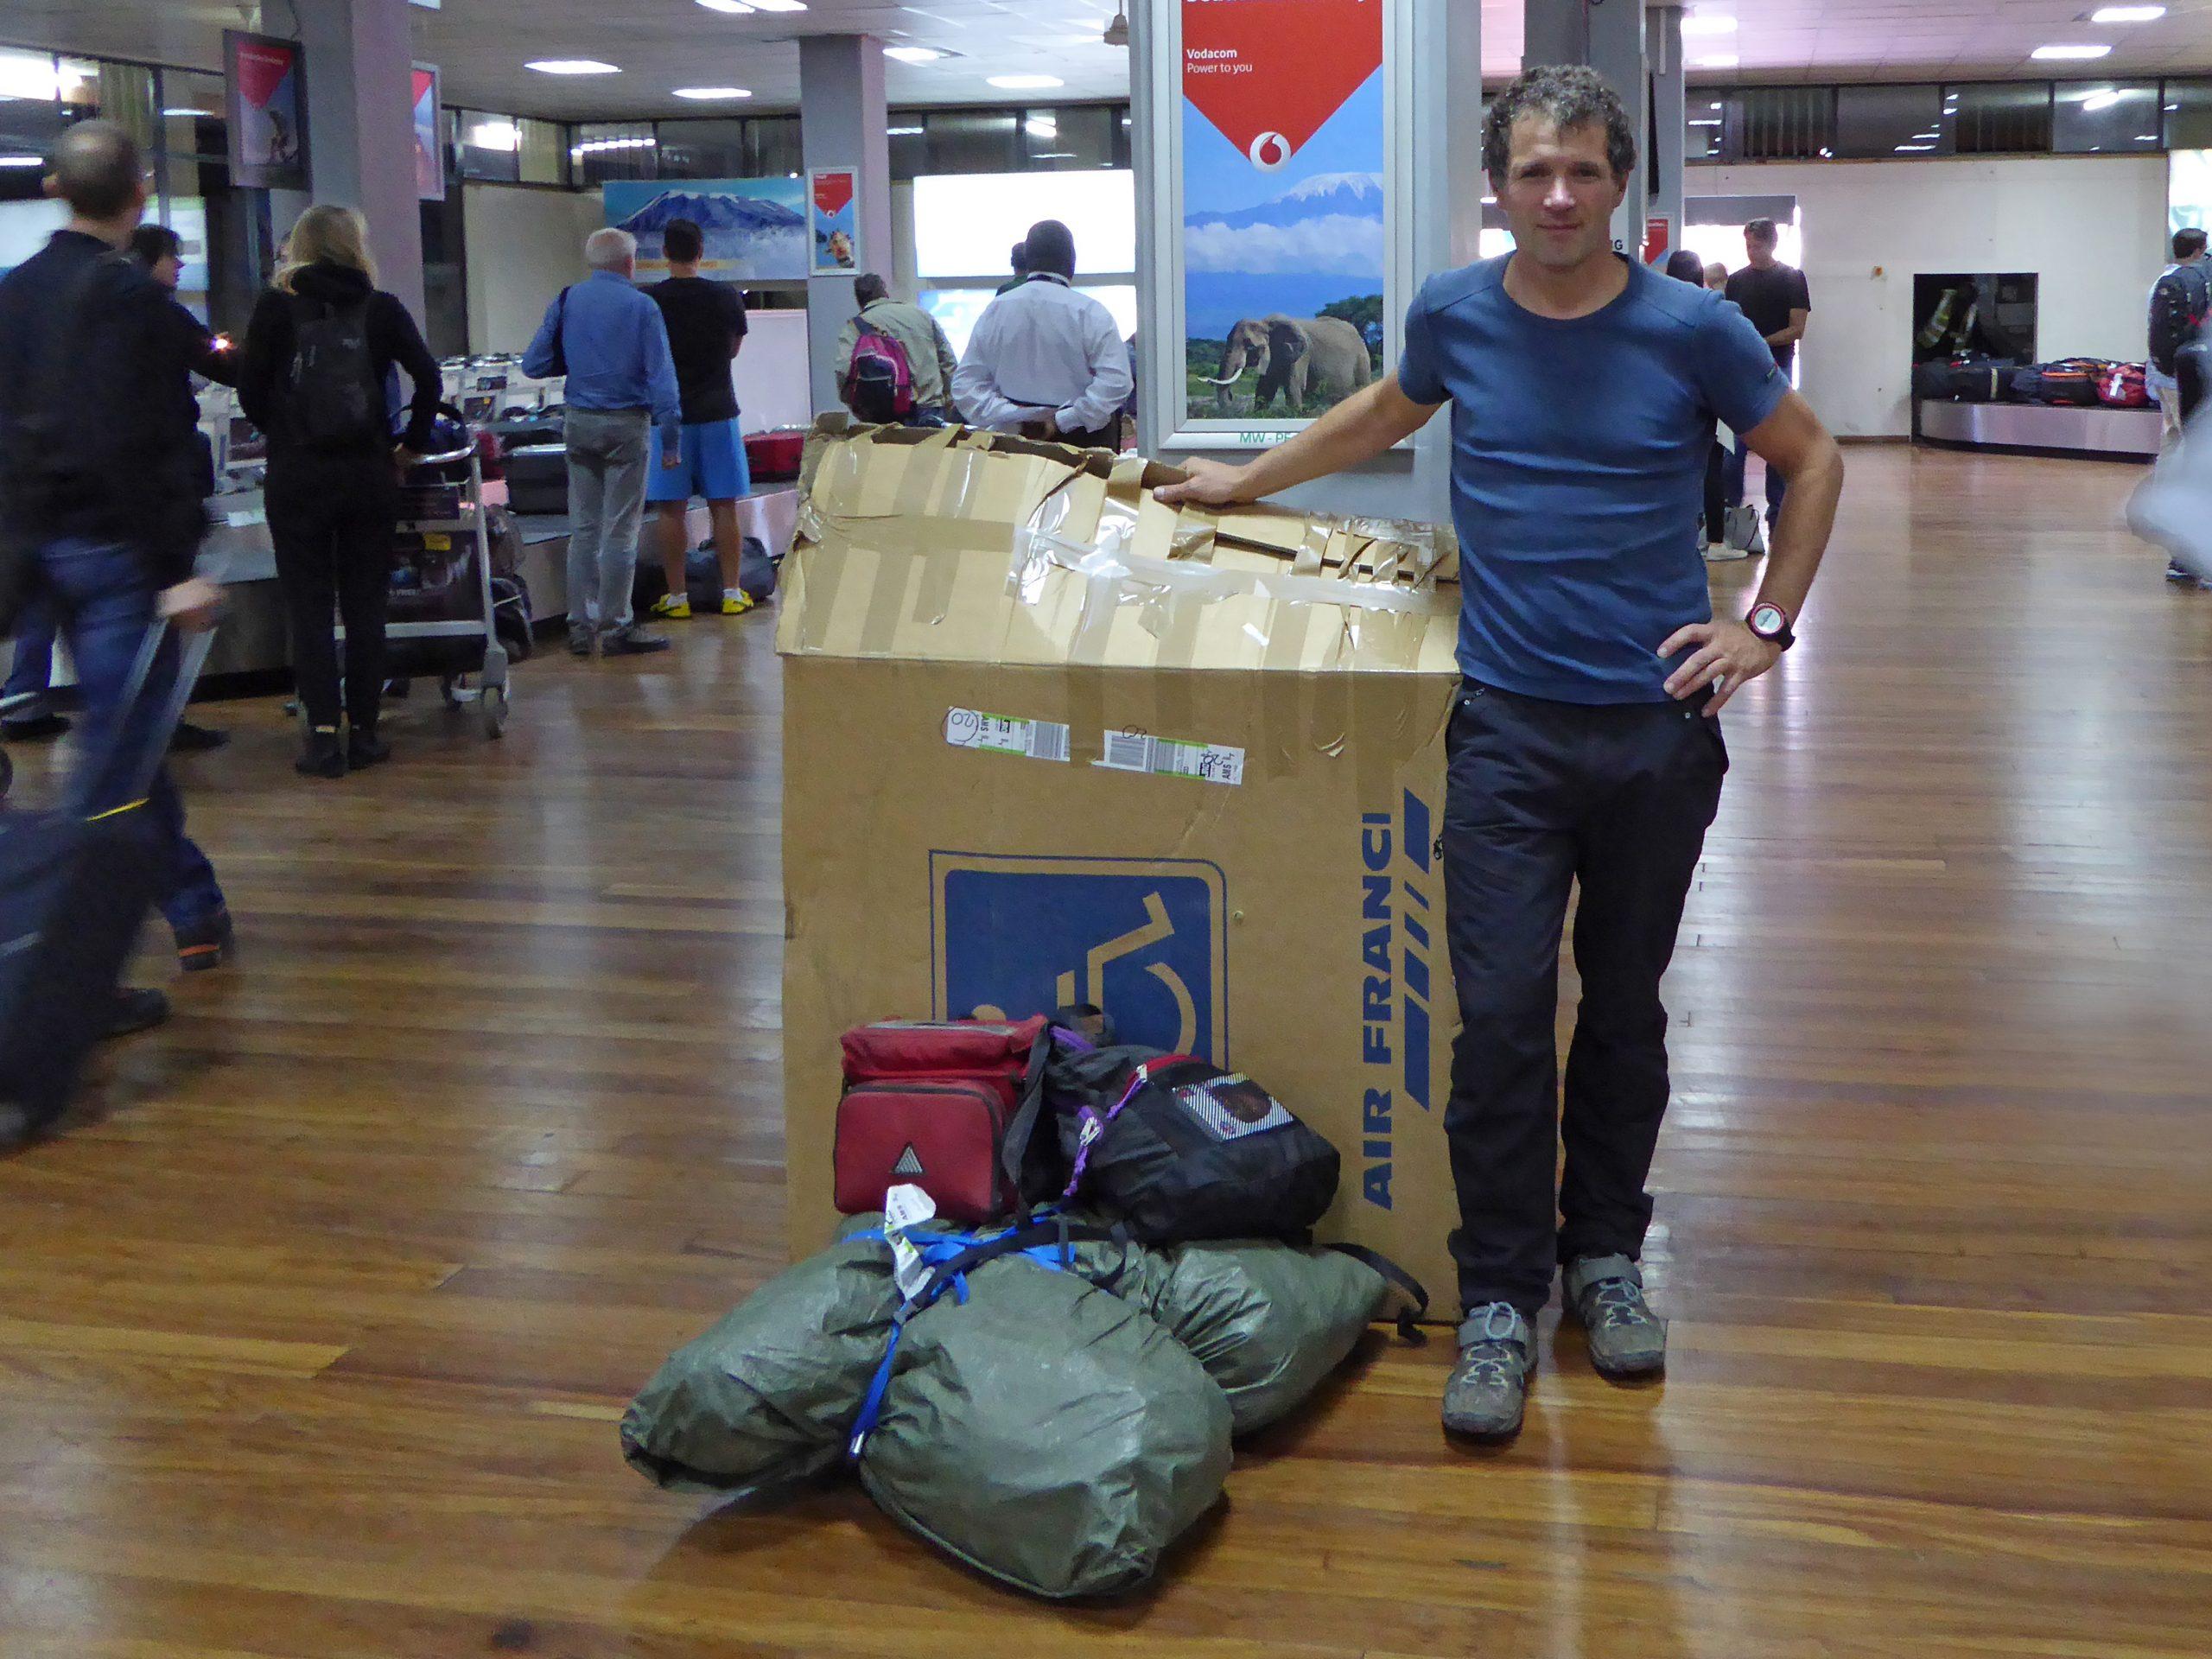 Radreise Afrika 2014 - Kilimanjaro International Airport